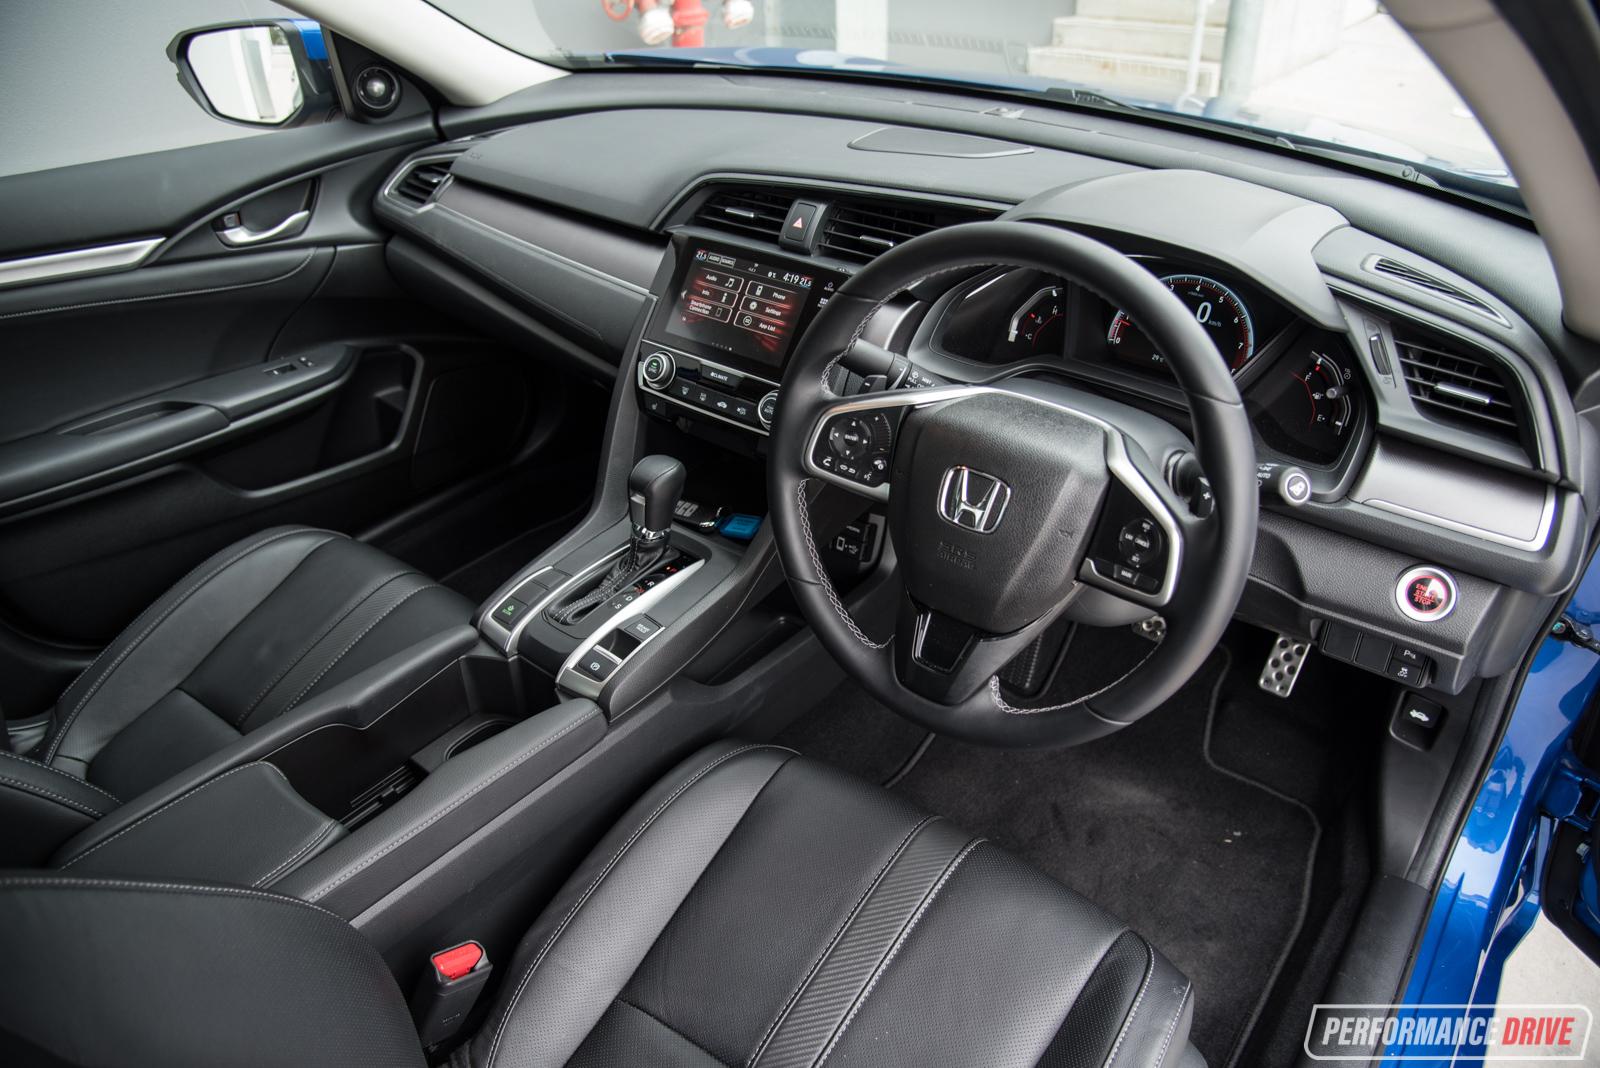 2016 Honda Civic Rs Turbo Review Video Performancedrive